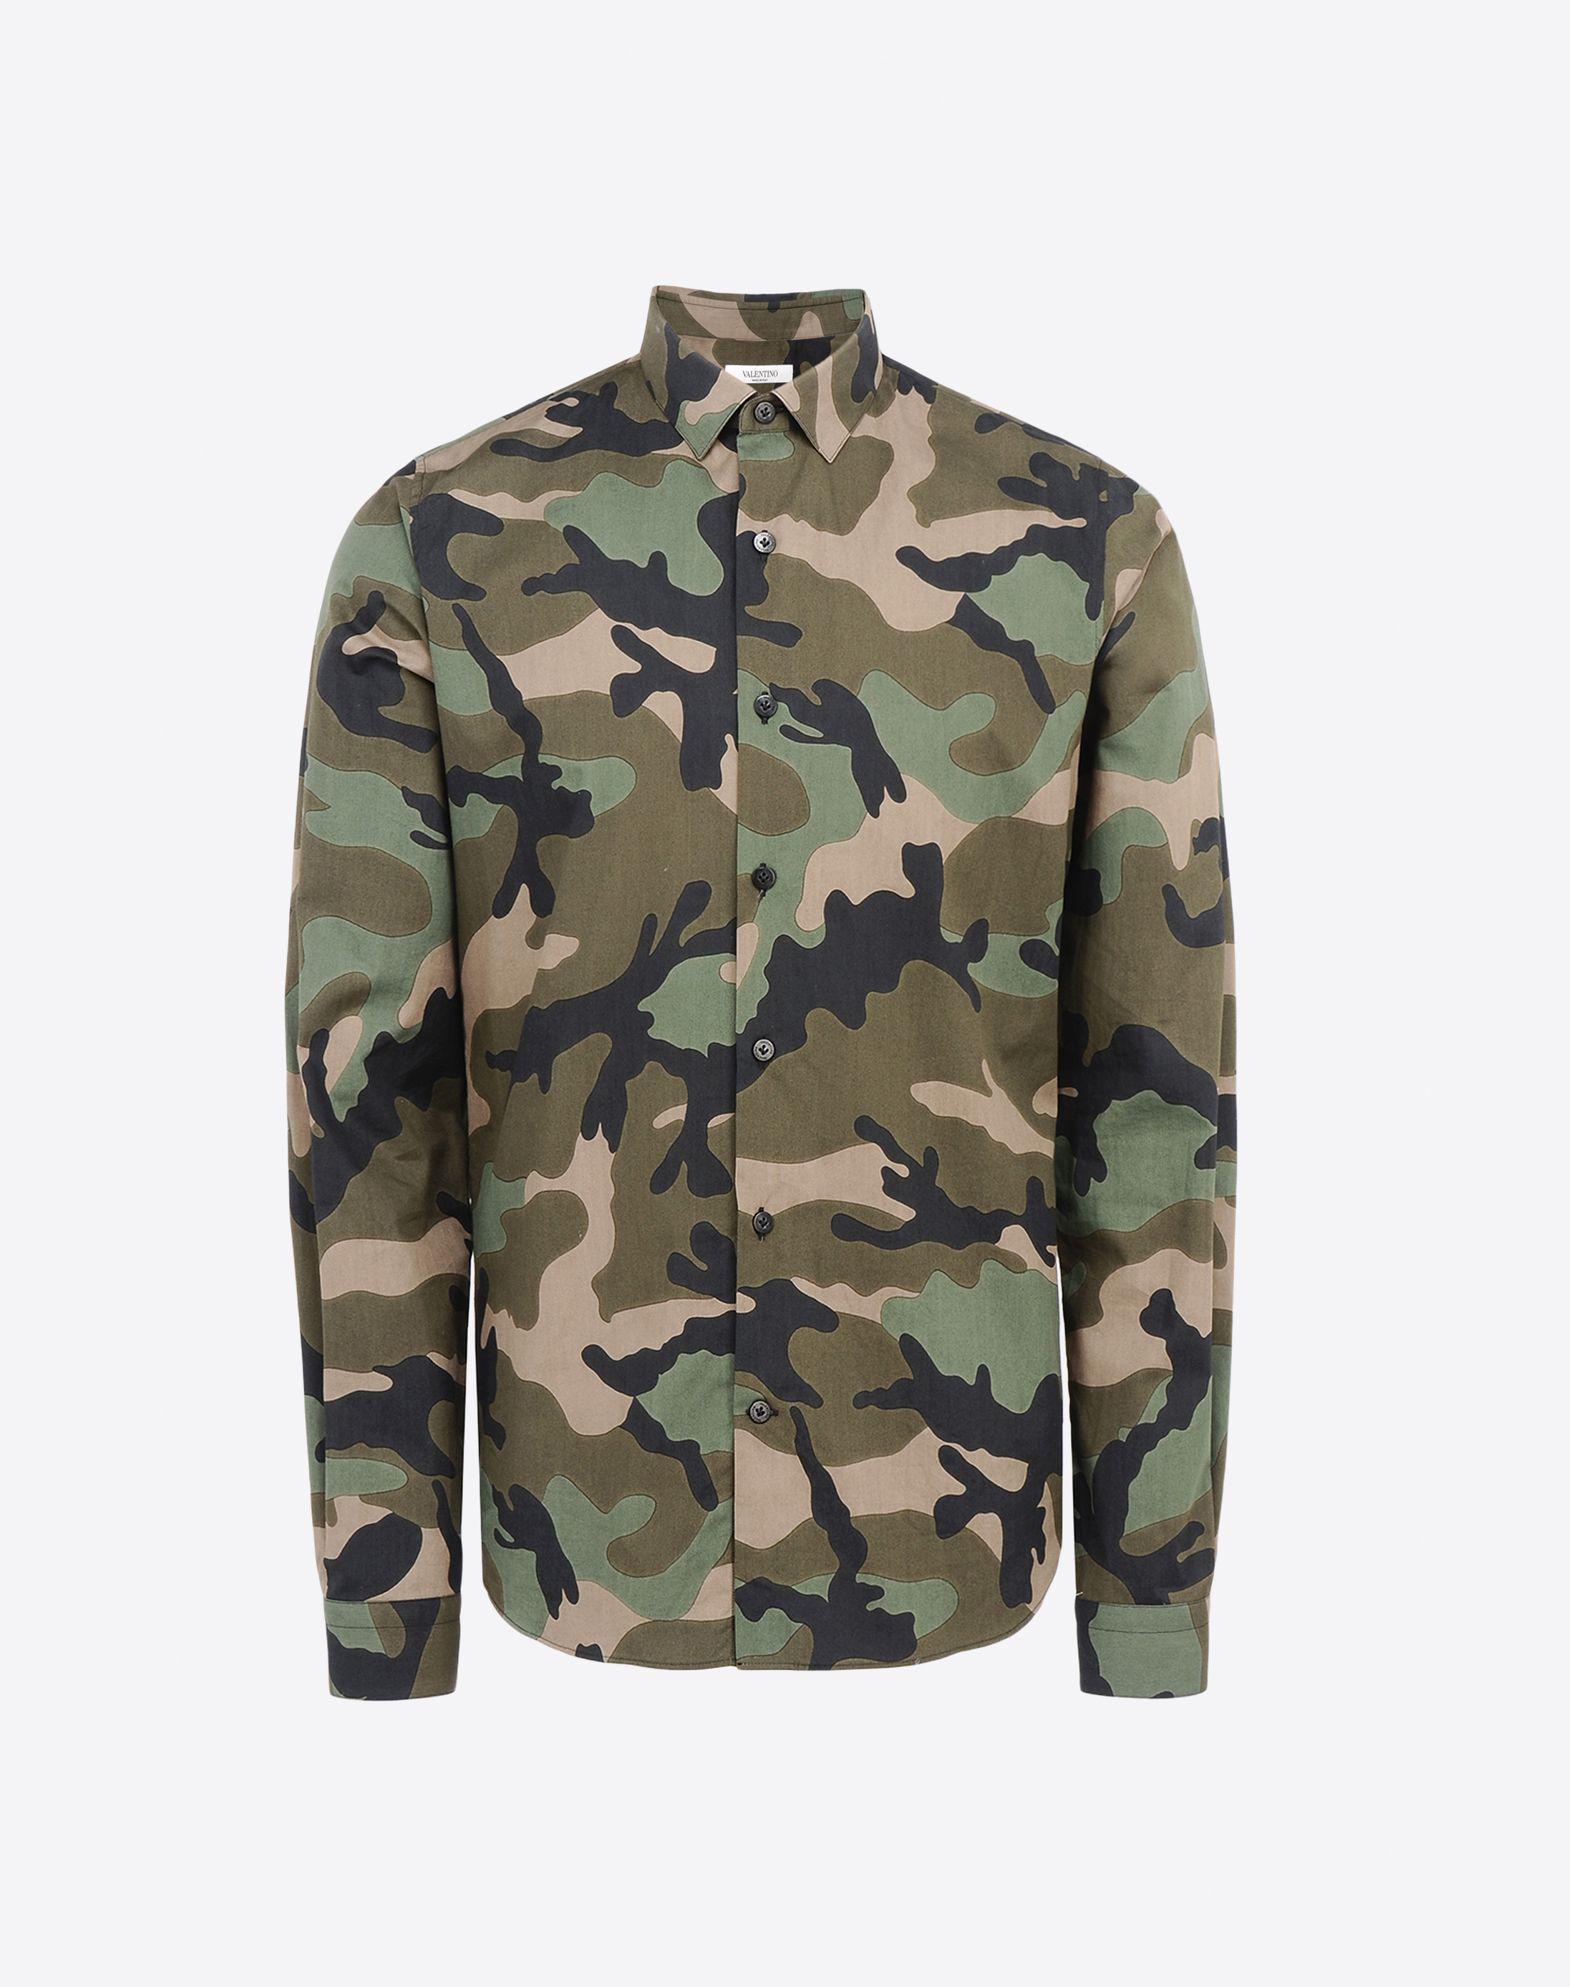 chemise camouflage militaire chemises homme valentino uomo boutique en ligne valentino. Black Bedroom Furniture Sets. Home Design Ideas